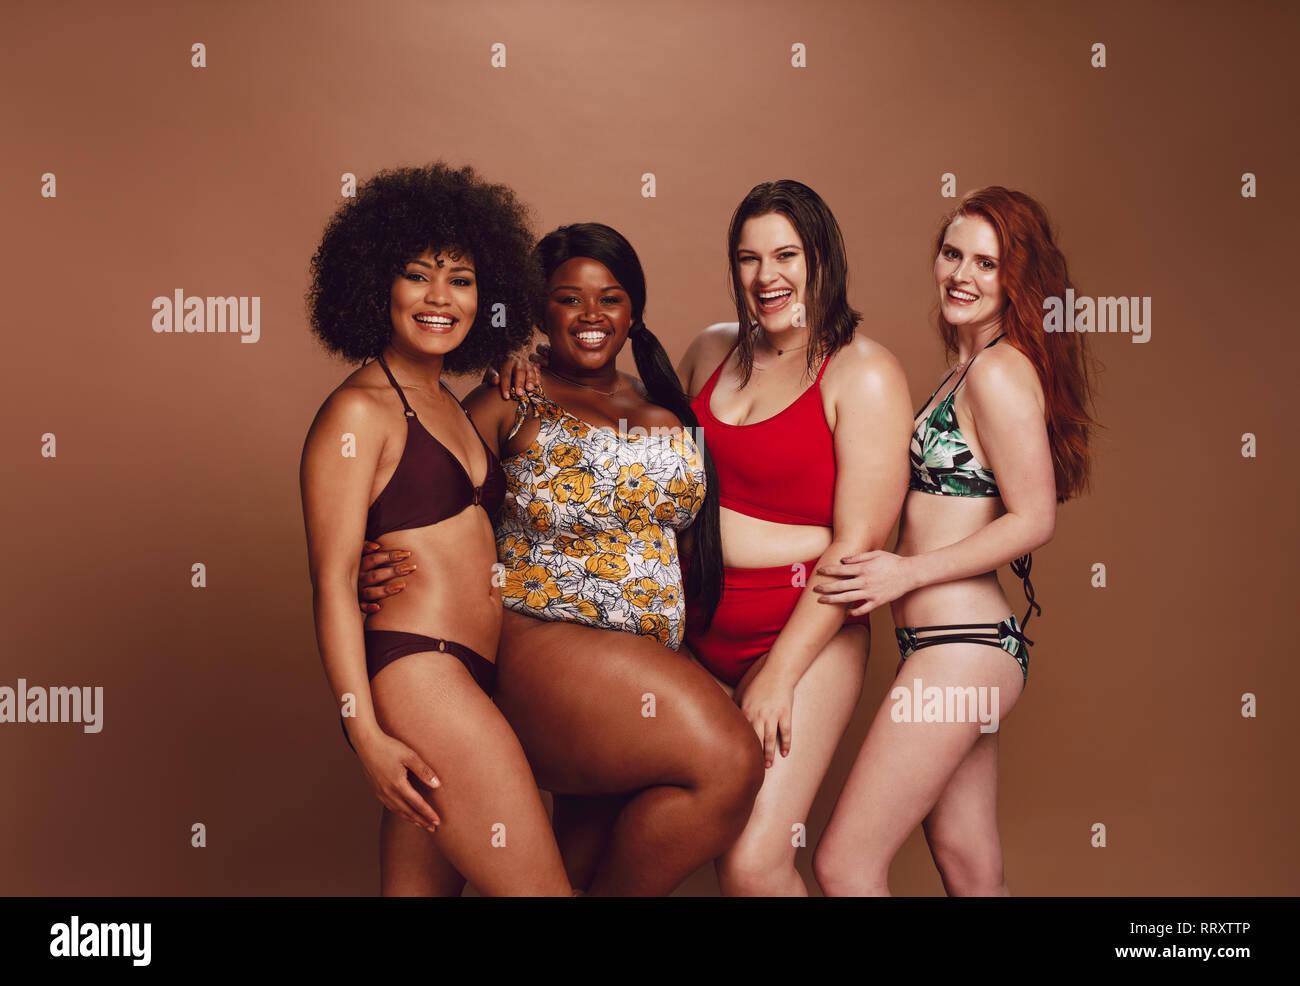 Alamy Bikinis Fotos Stockamp; De Black Imágenes rodCBQxeW